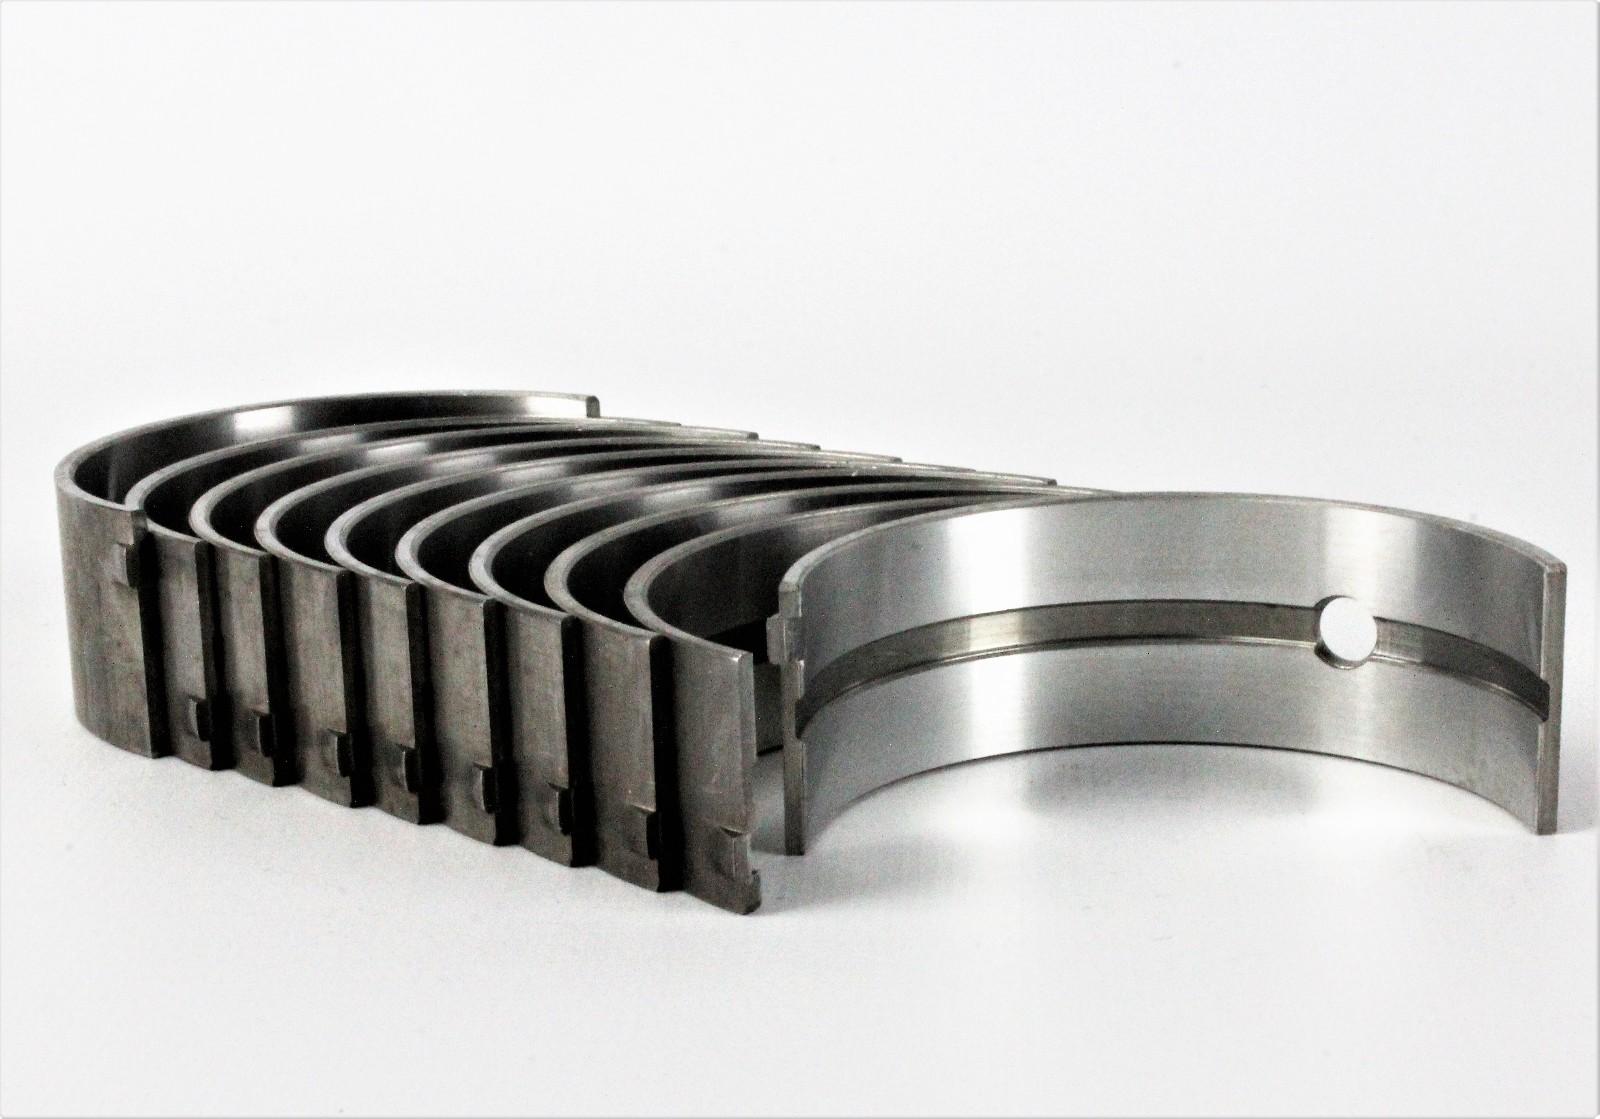 DNJ Engine Components MB168.30 Engine Main Bearing Set